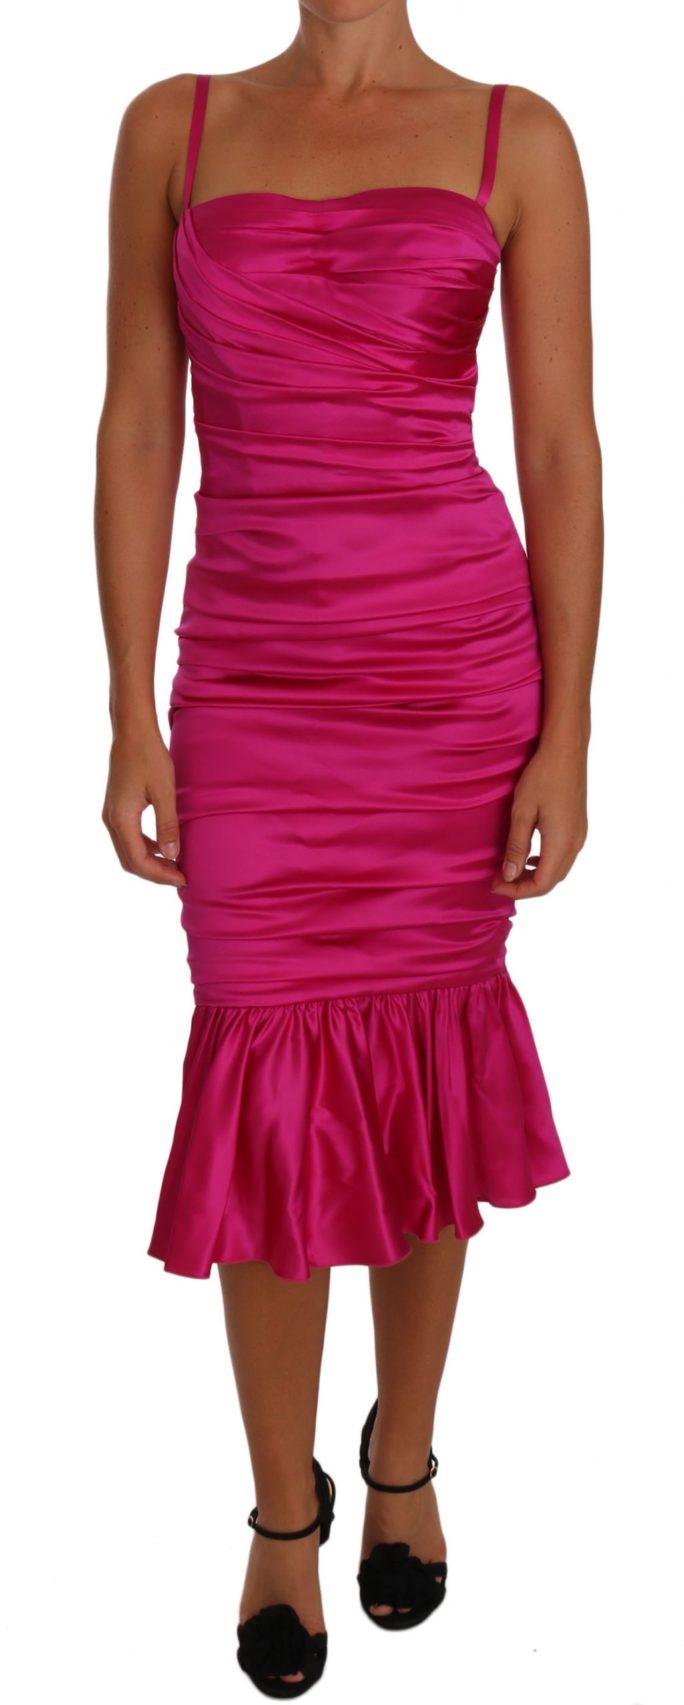 635578 Pink Corset Mermaid Bustier Ruched Dress.jpg